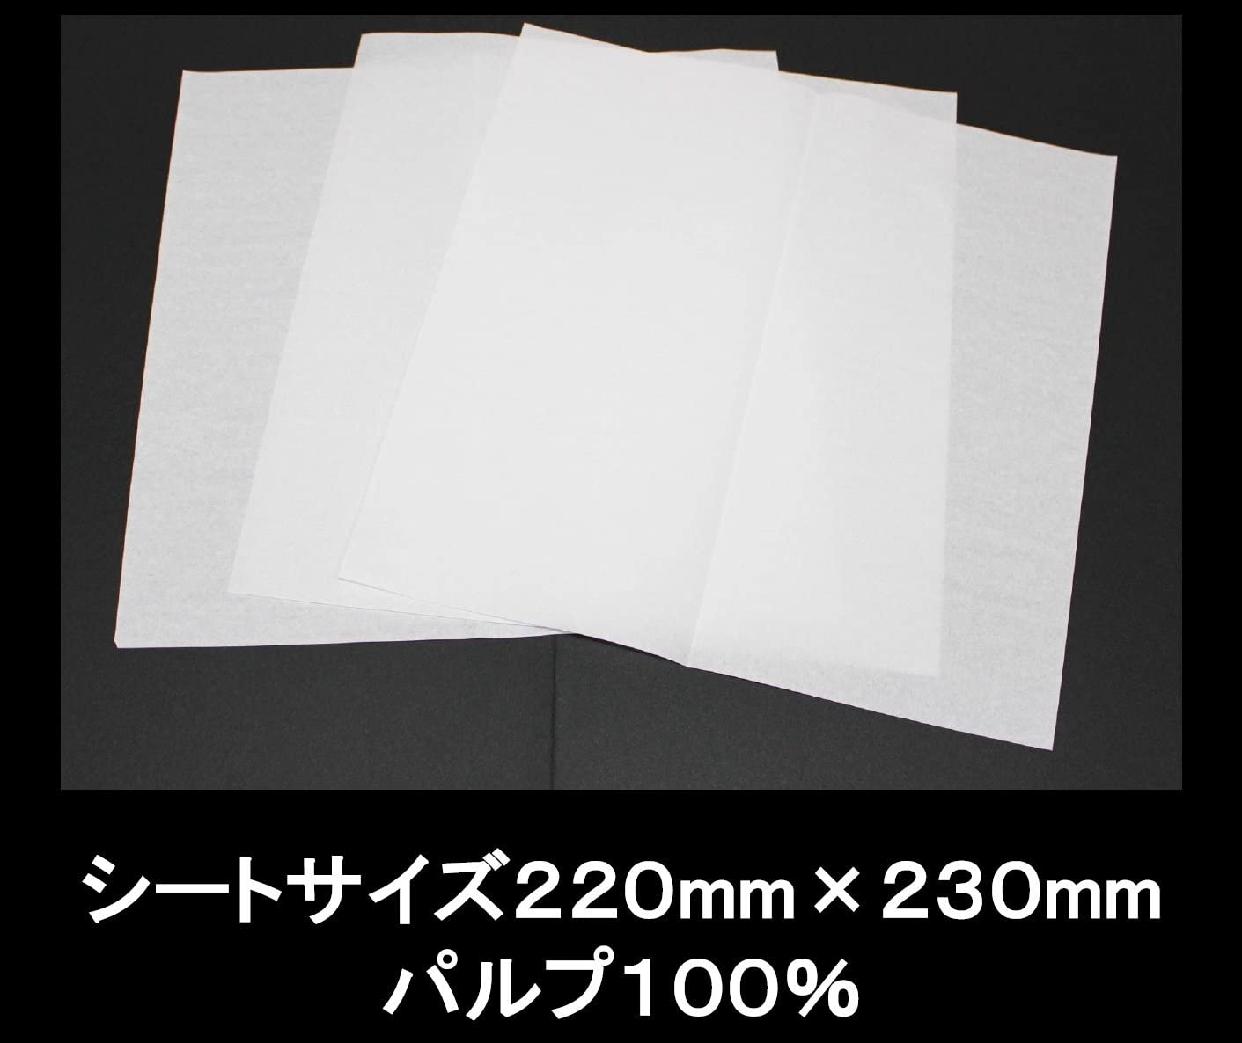 Kleenex(クリネックス) 水解性 ハンドタオル200 200枚の商品画像3